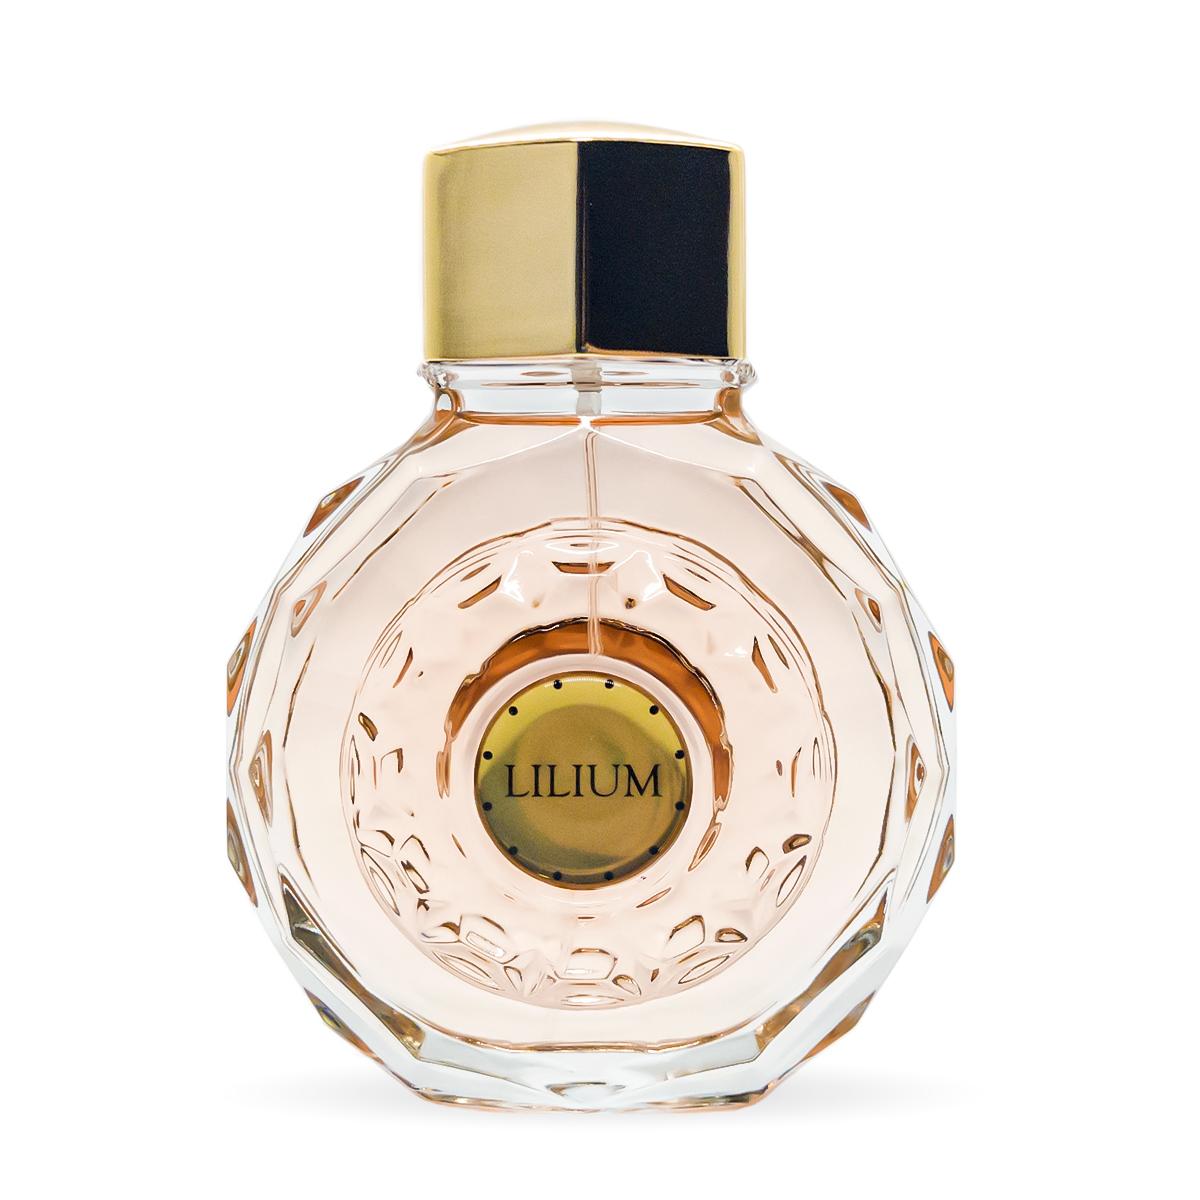 Perfume Lilium Feminino Edp 100ml Paris Bleu